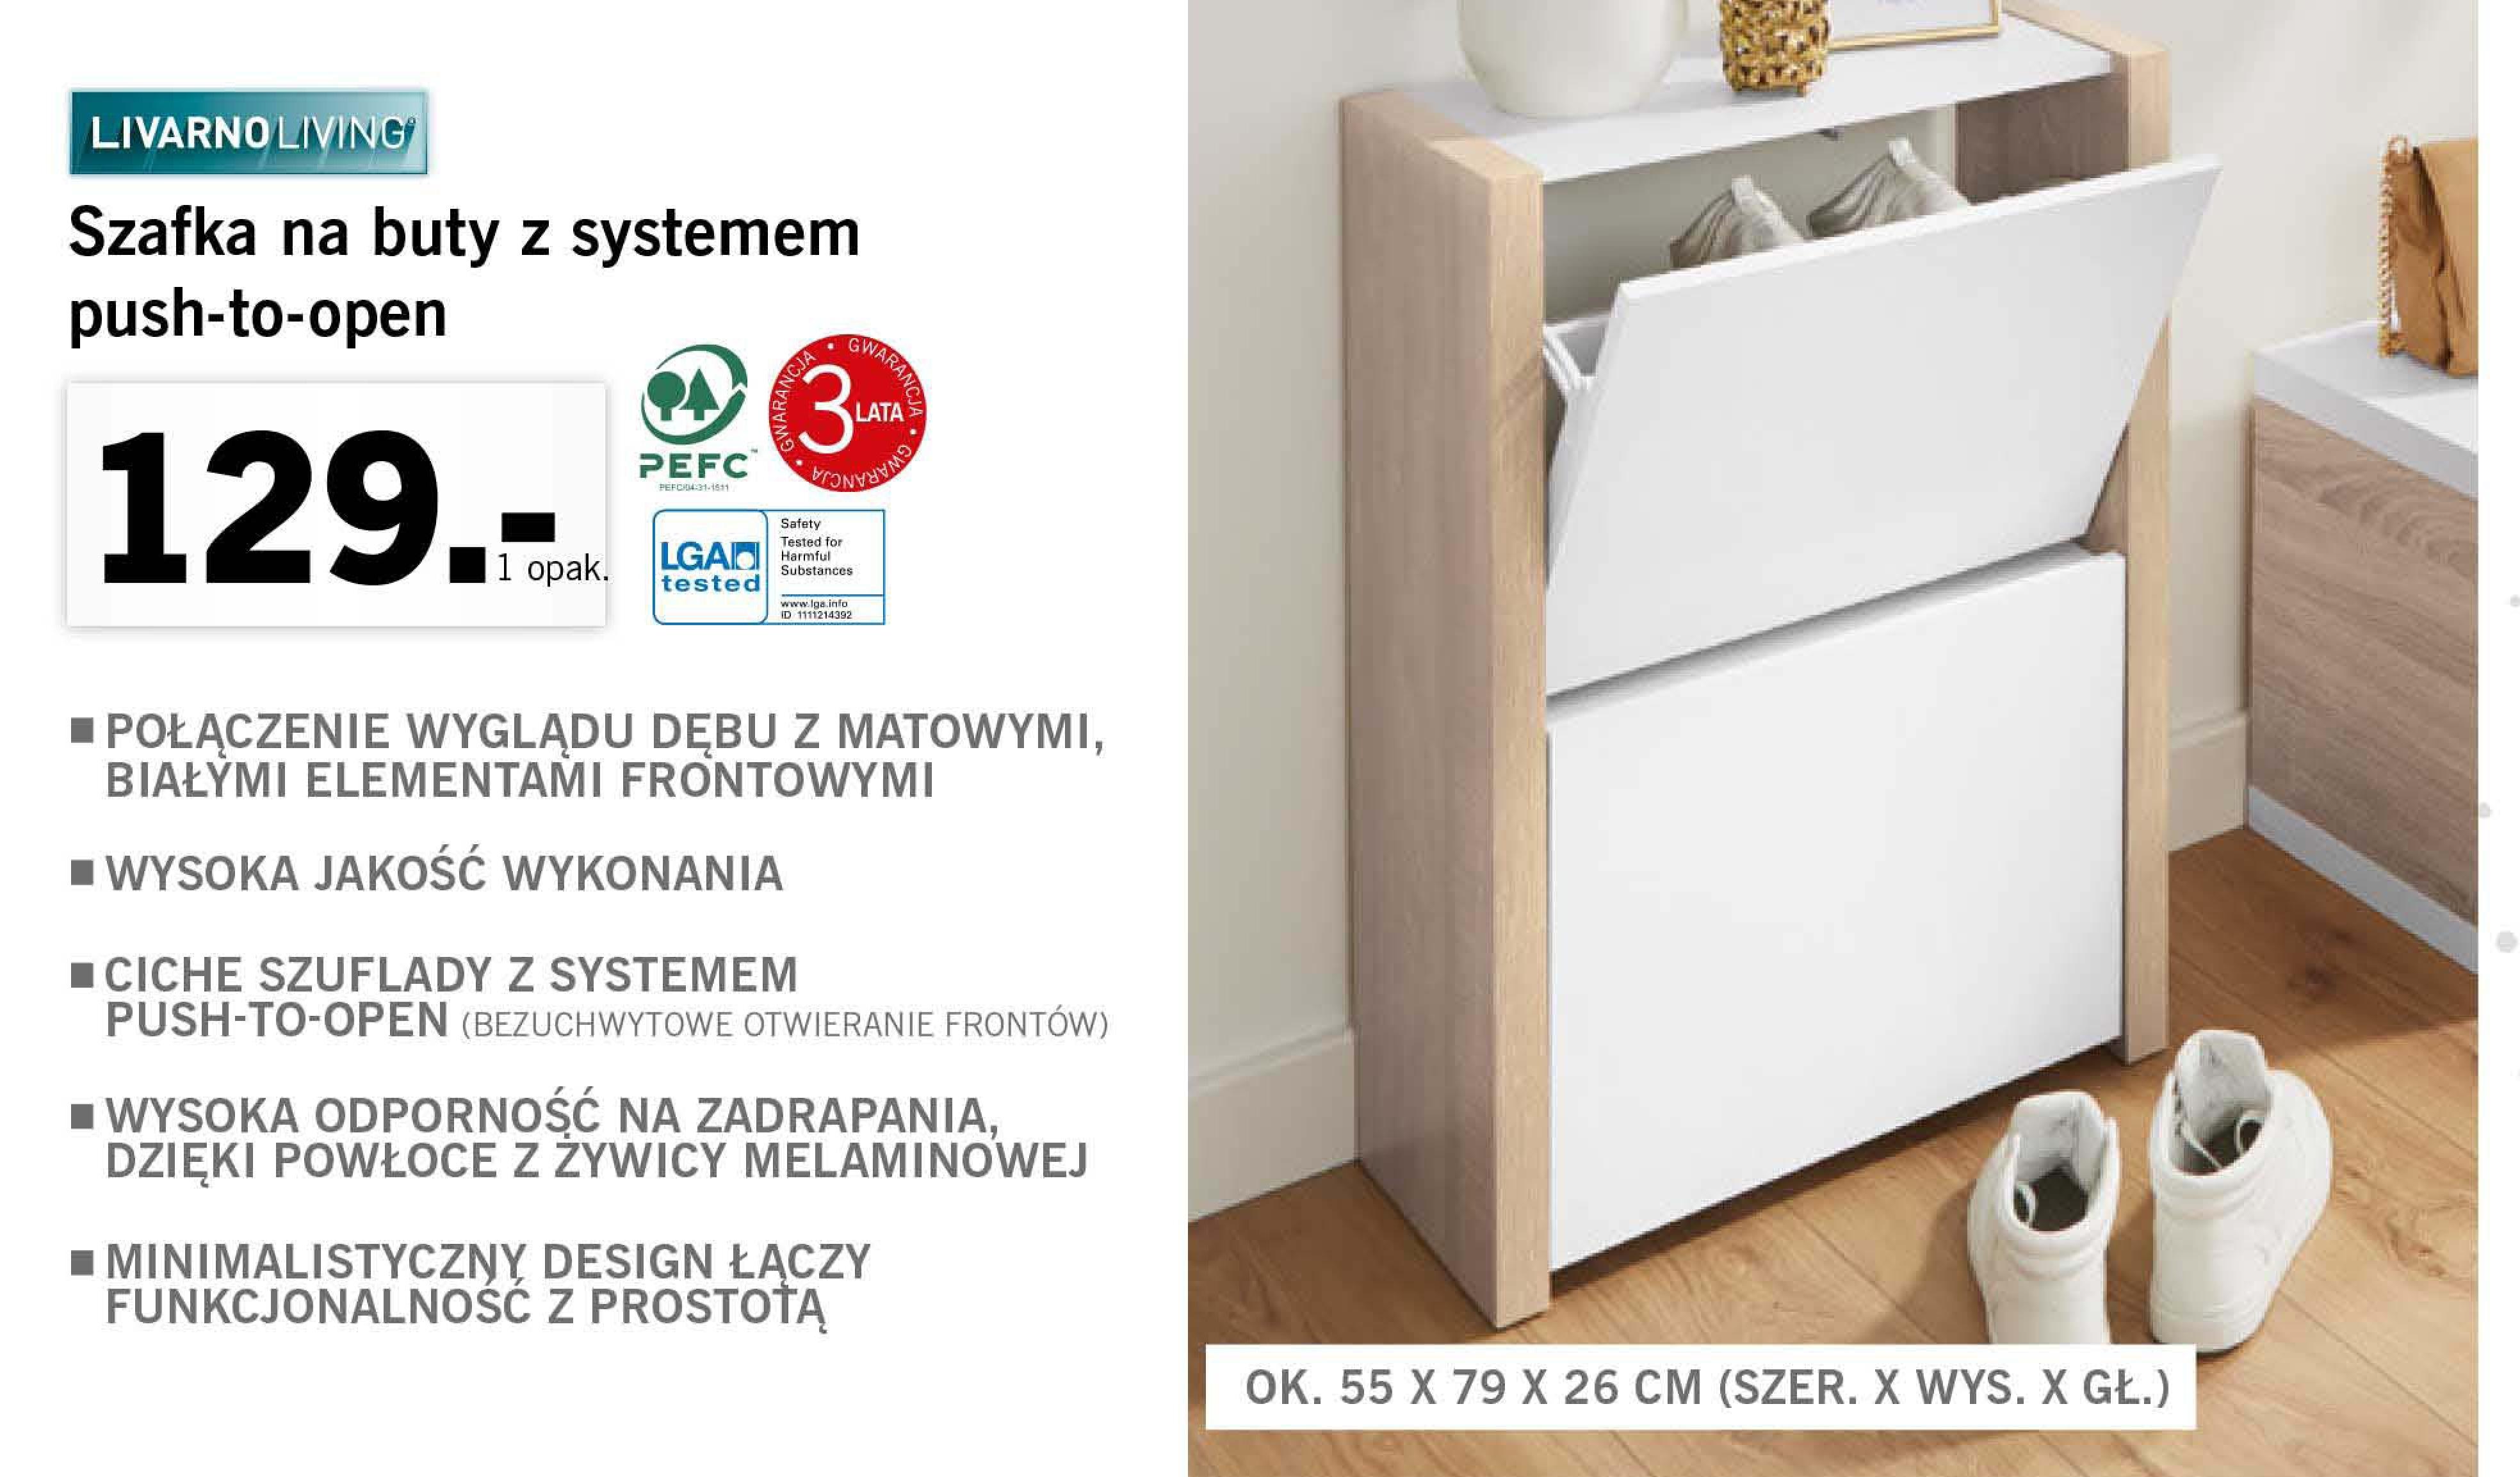 Archiwum Szafka Na Buty Lidl 23 04 2018 29 04 2018 Promoceny Pl Ulotki Promocje Znizki